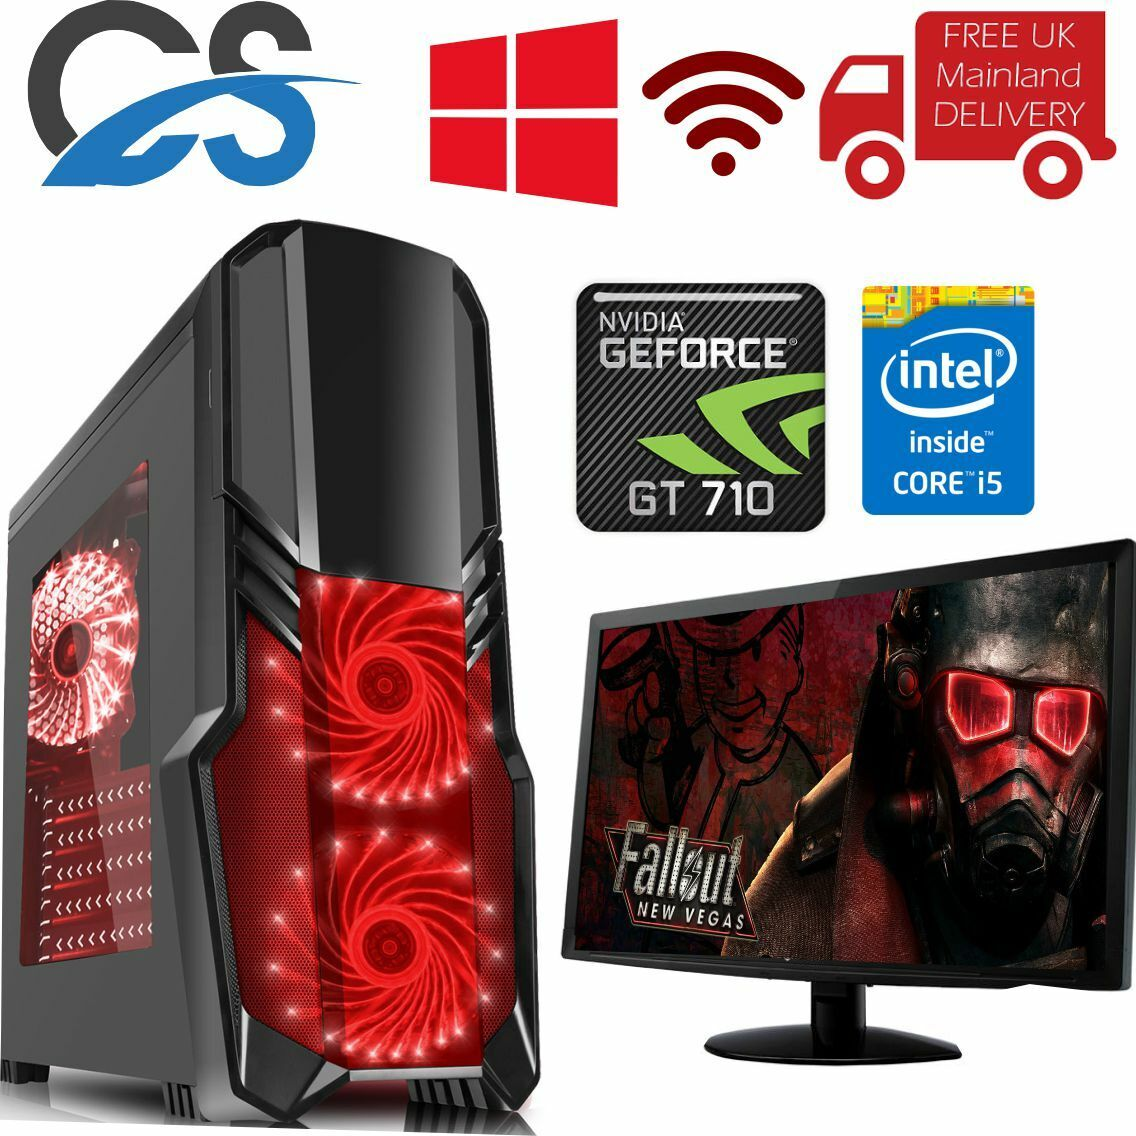 Computer Games - ULTRA FAST Gaming PC Computer Quad Core i5 1TB 16GB Windows 10 Desktop 2GB GT710